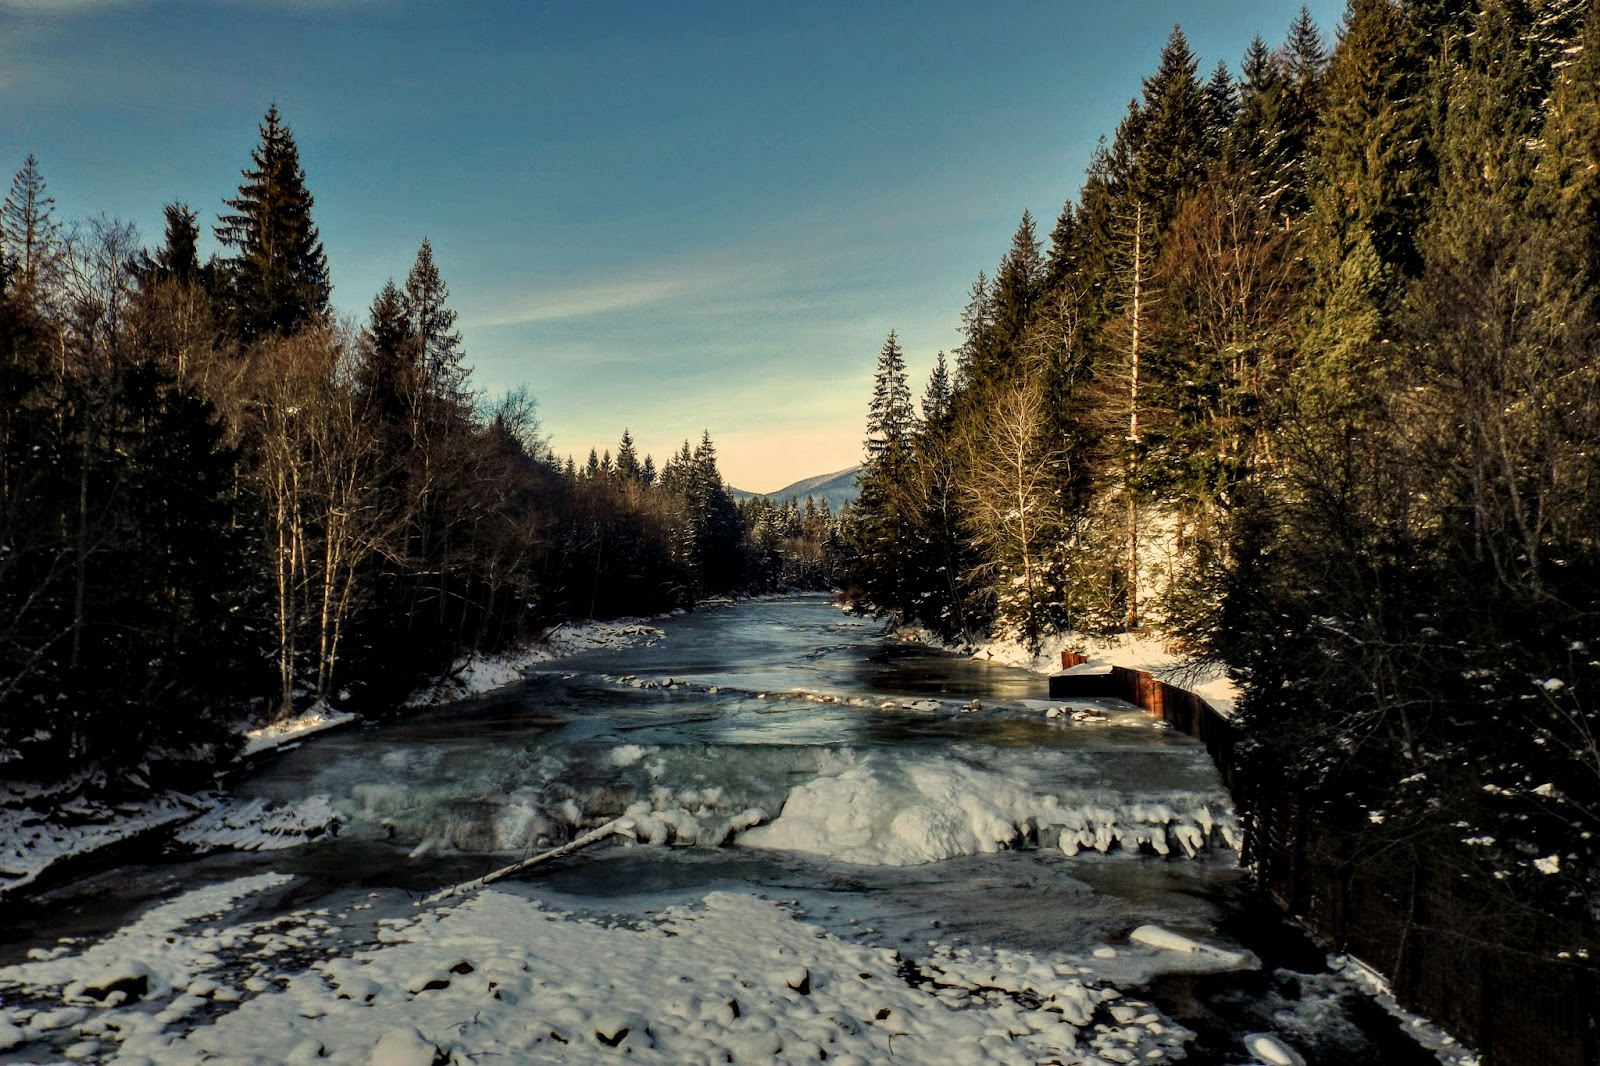 річка Молода, дамба